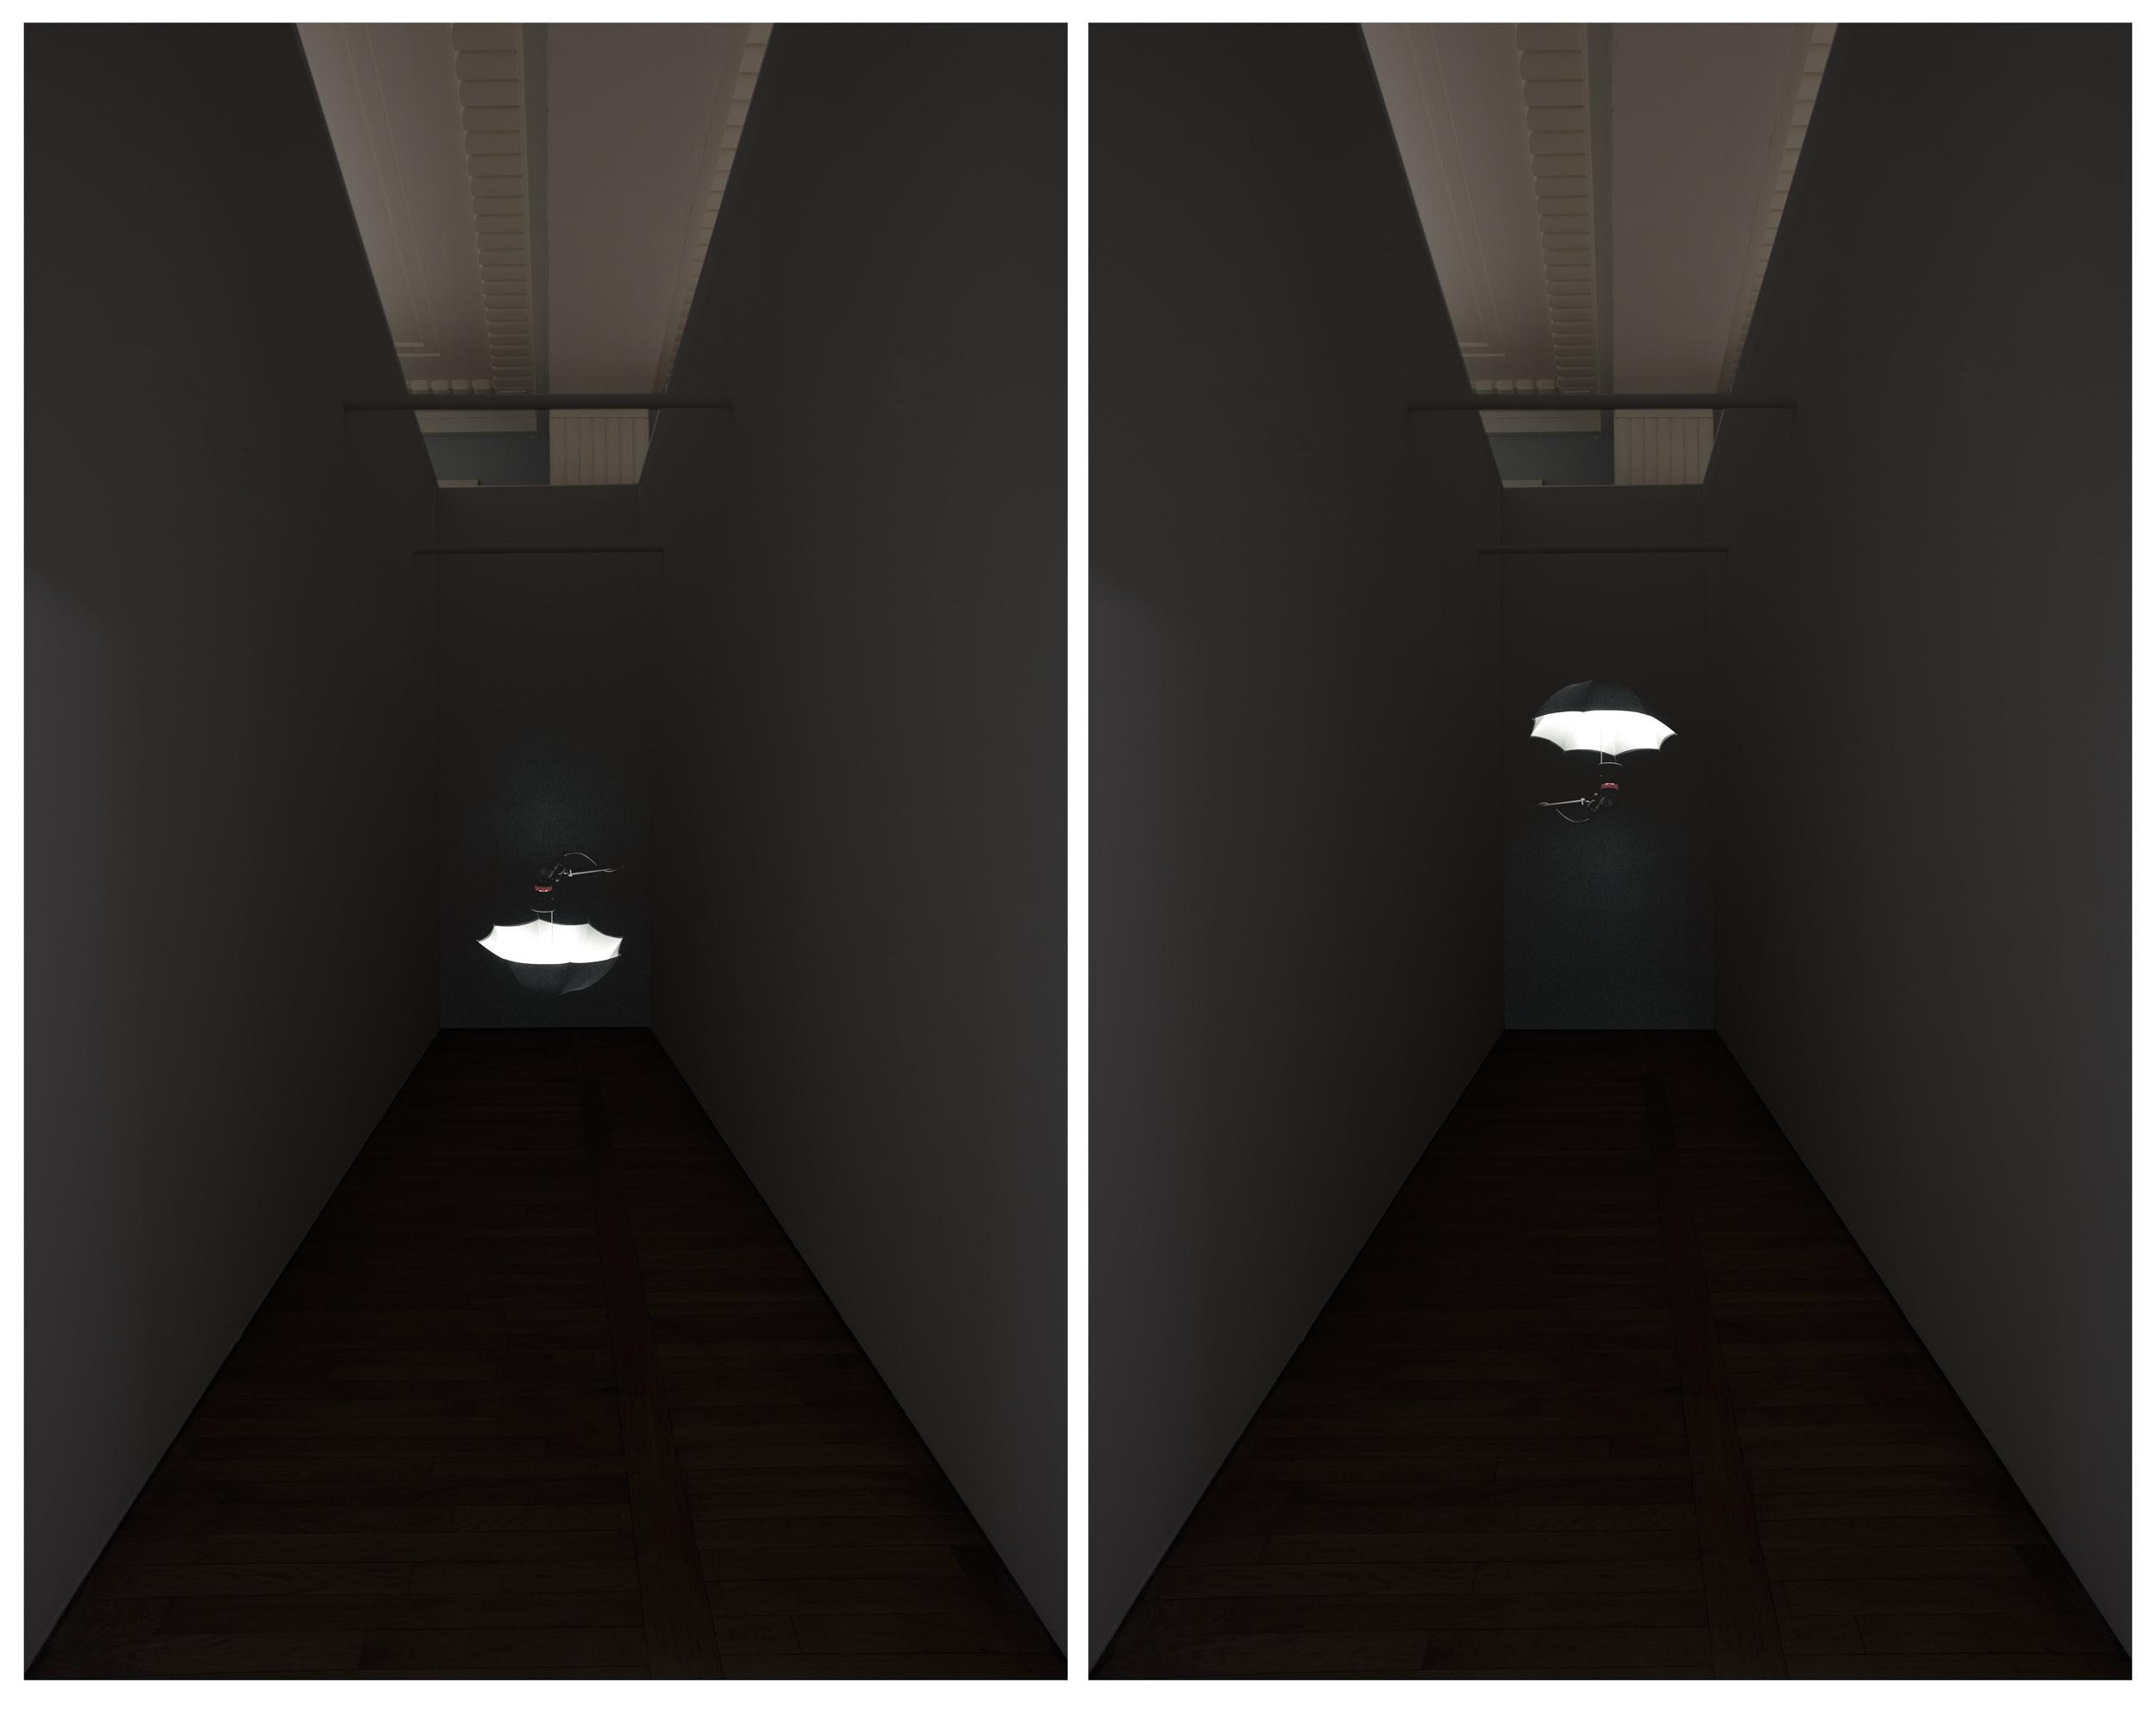 magic montage2 images.jpg